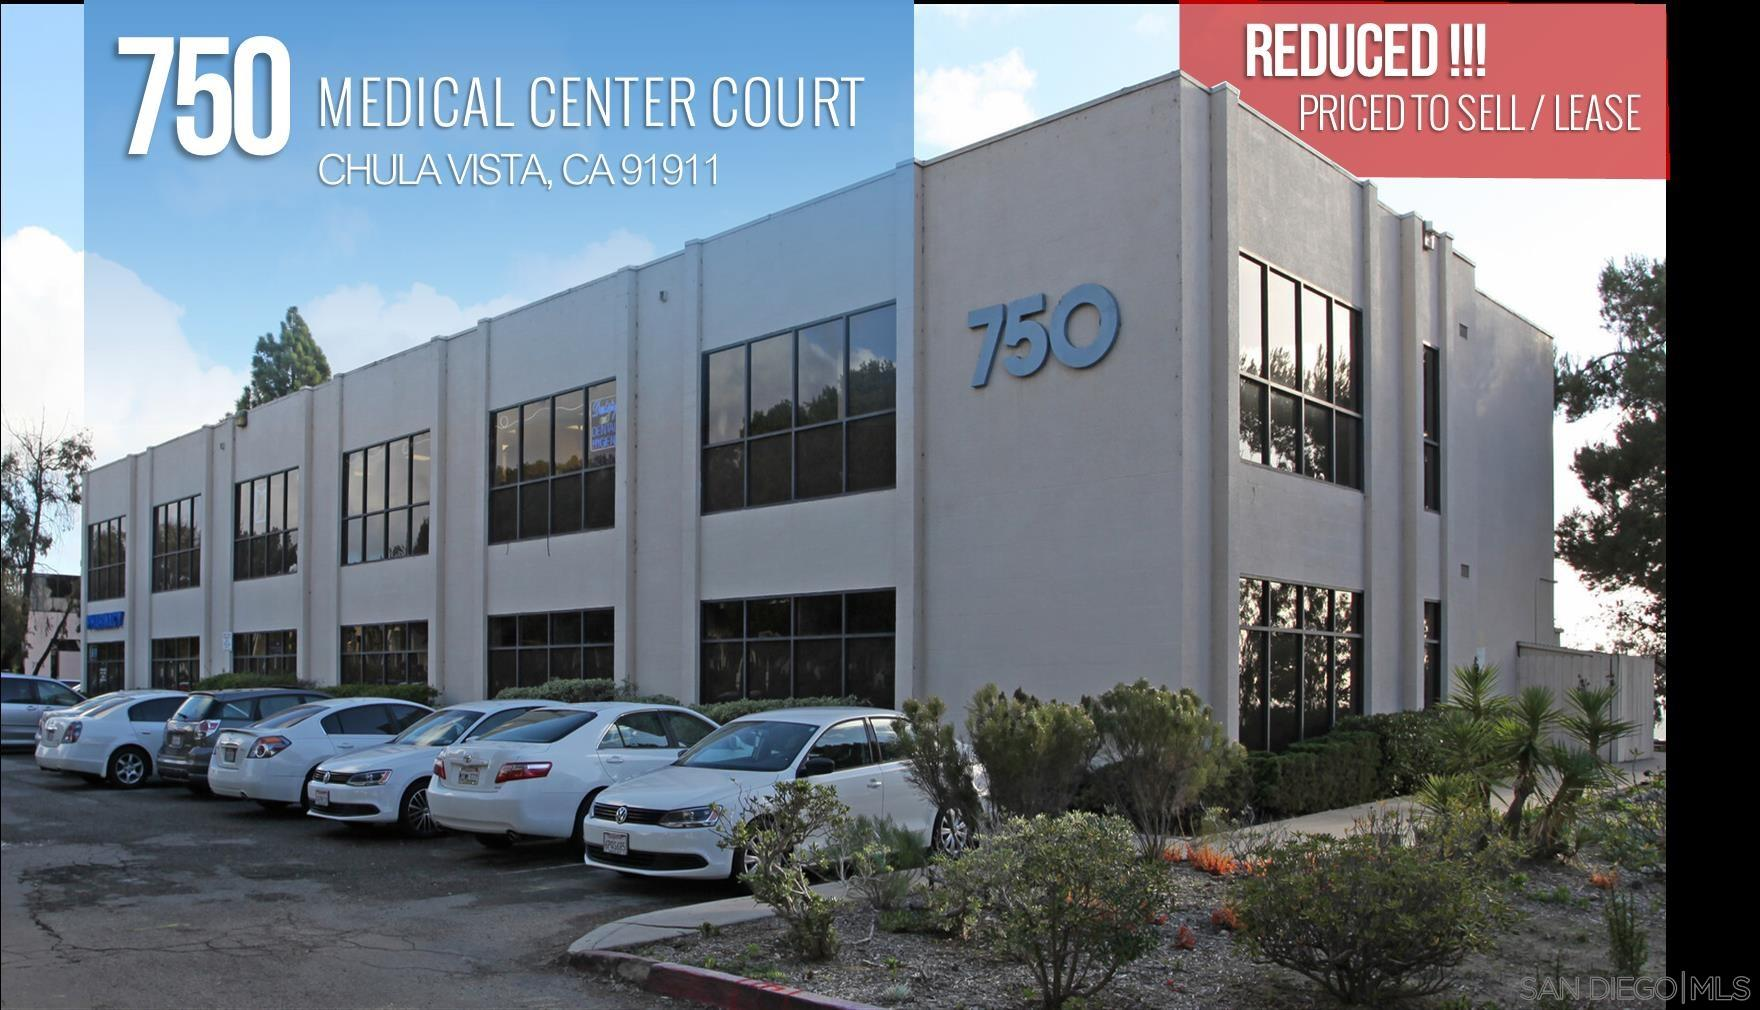 750 Medical Center Court, Suite 4, Chula Vista CA 91911